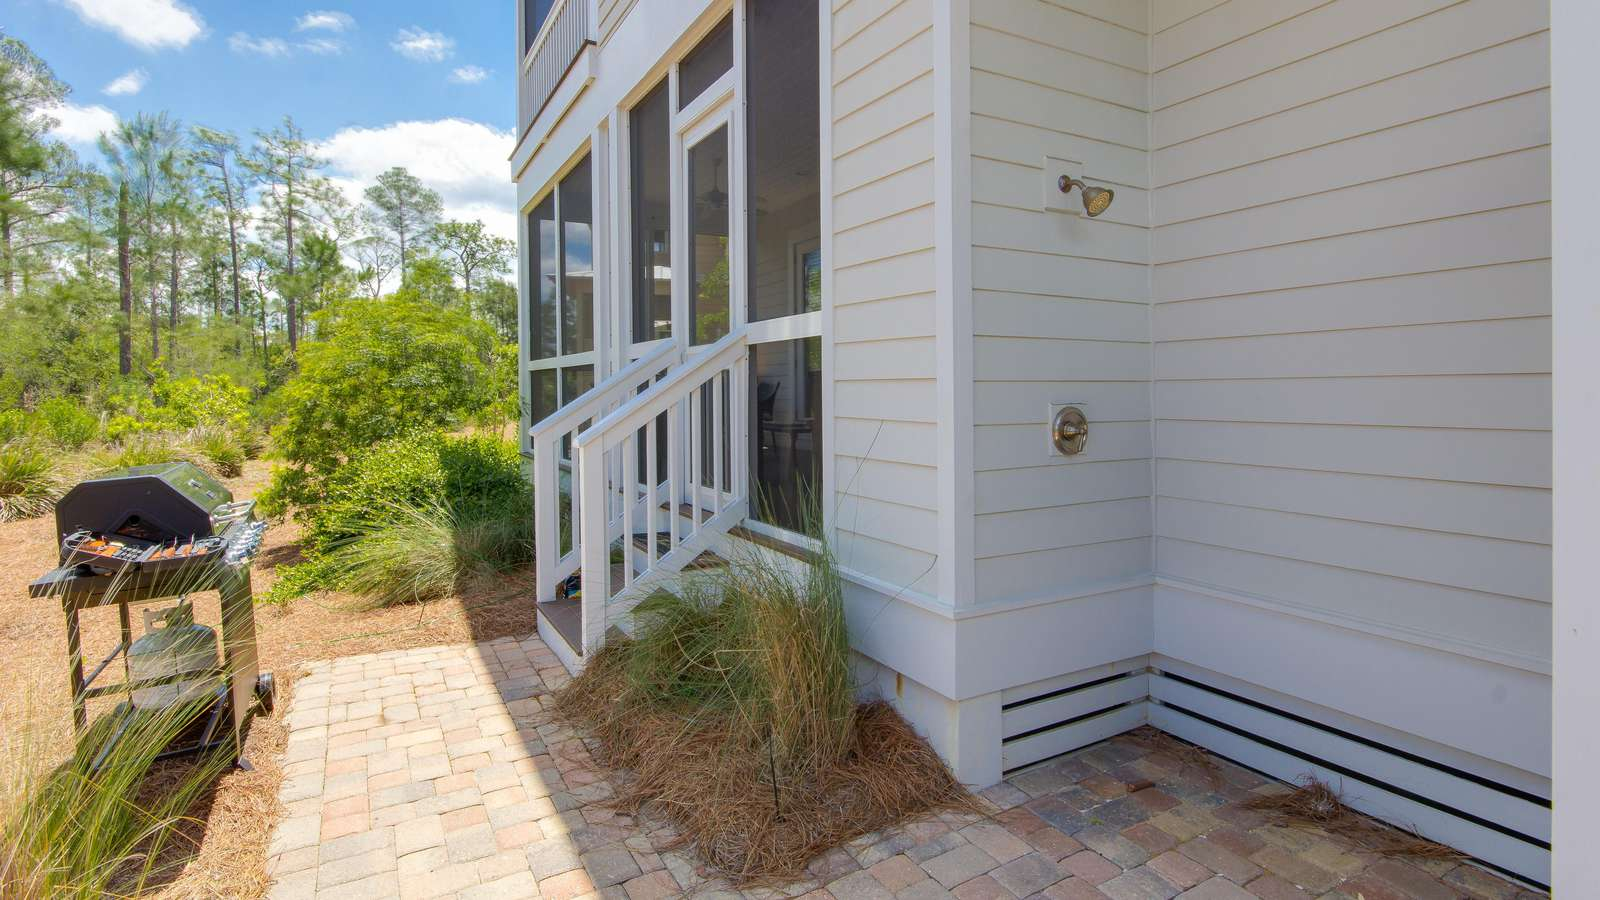 gas grill, shower, backyard privacy